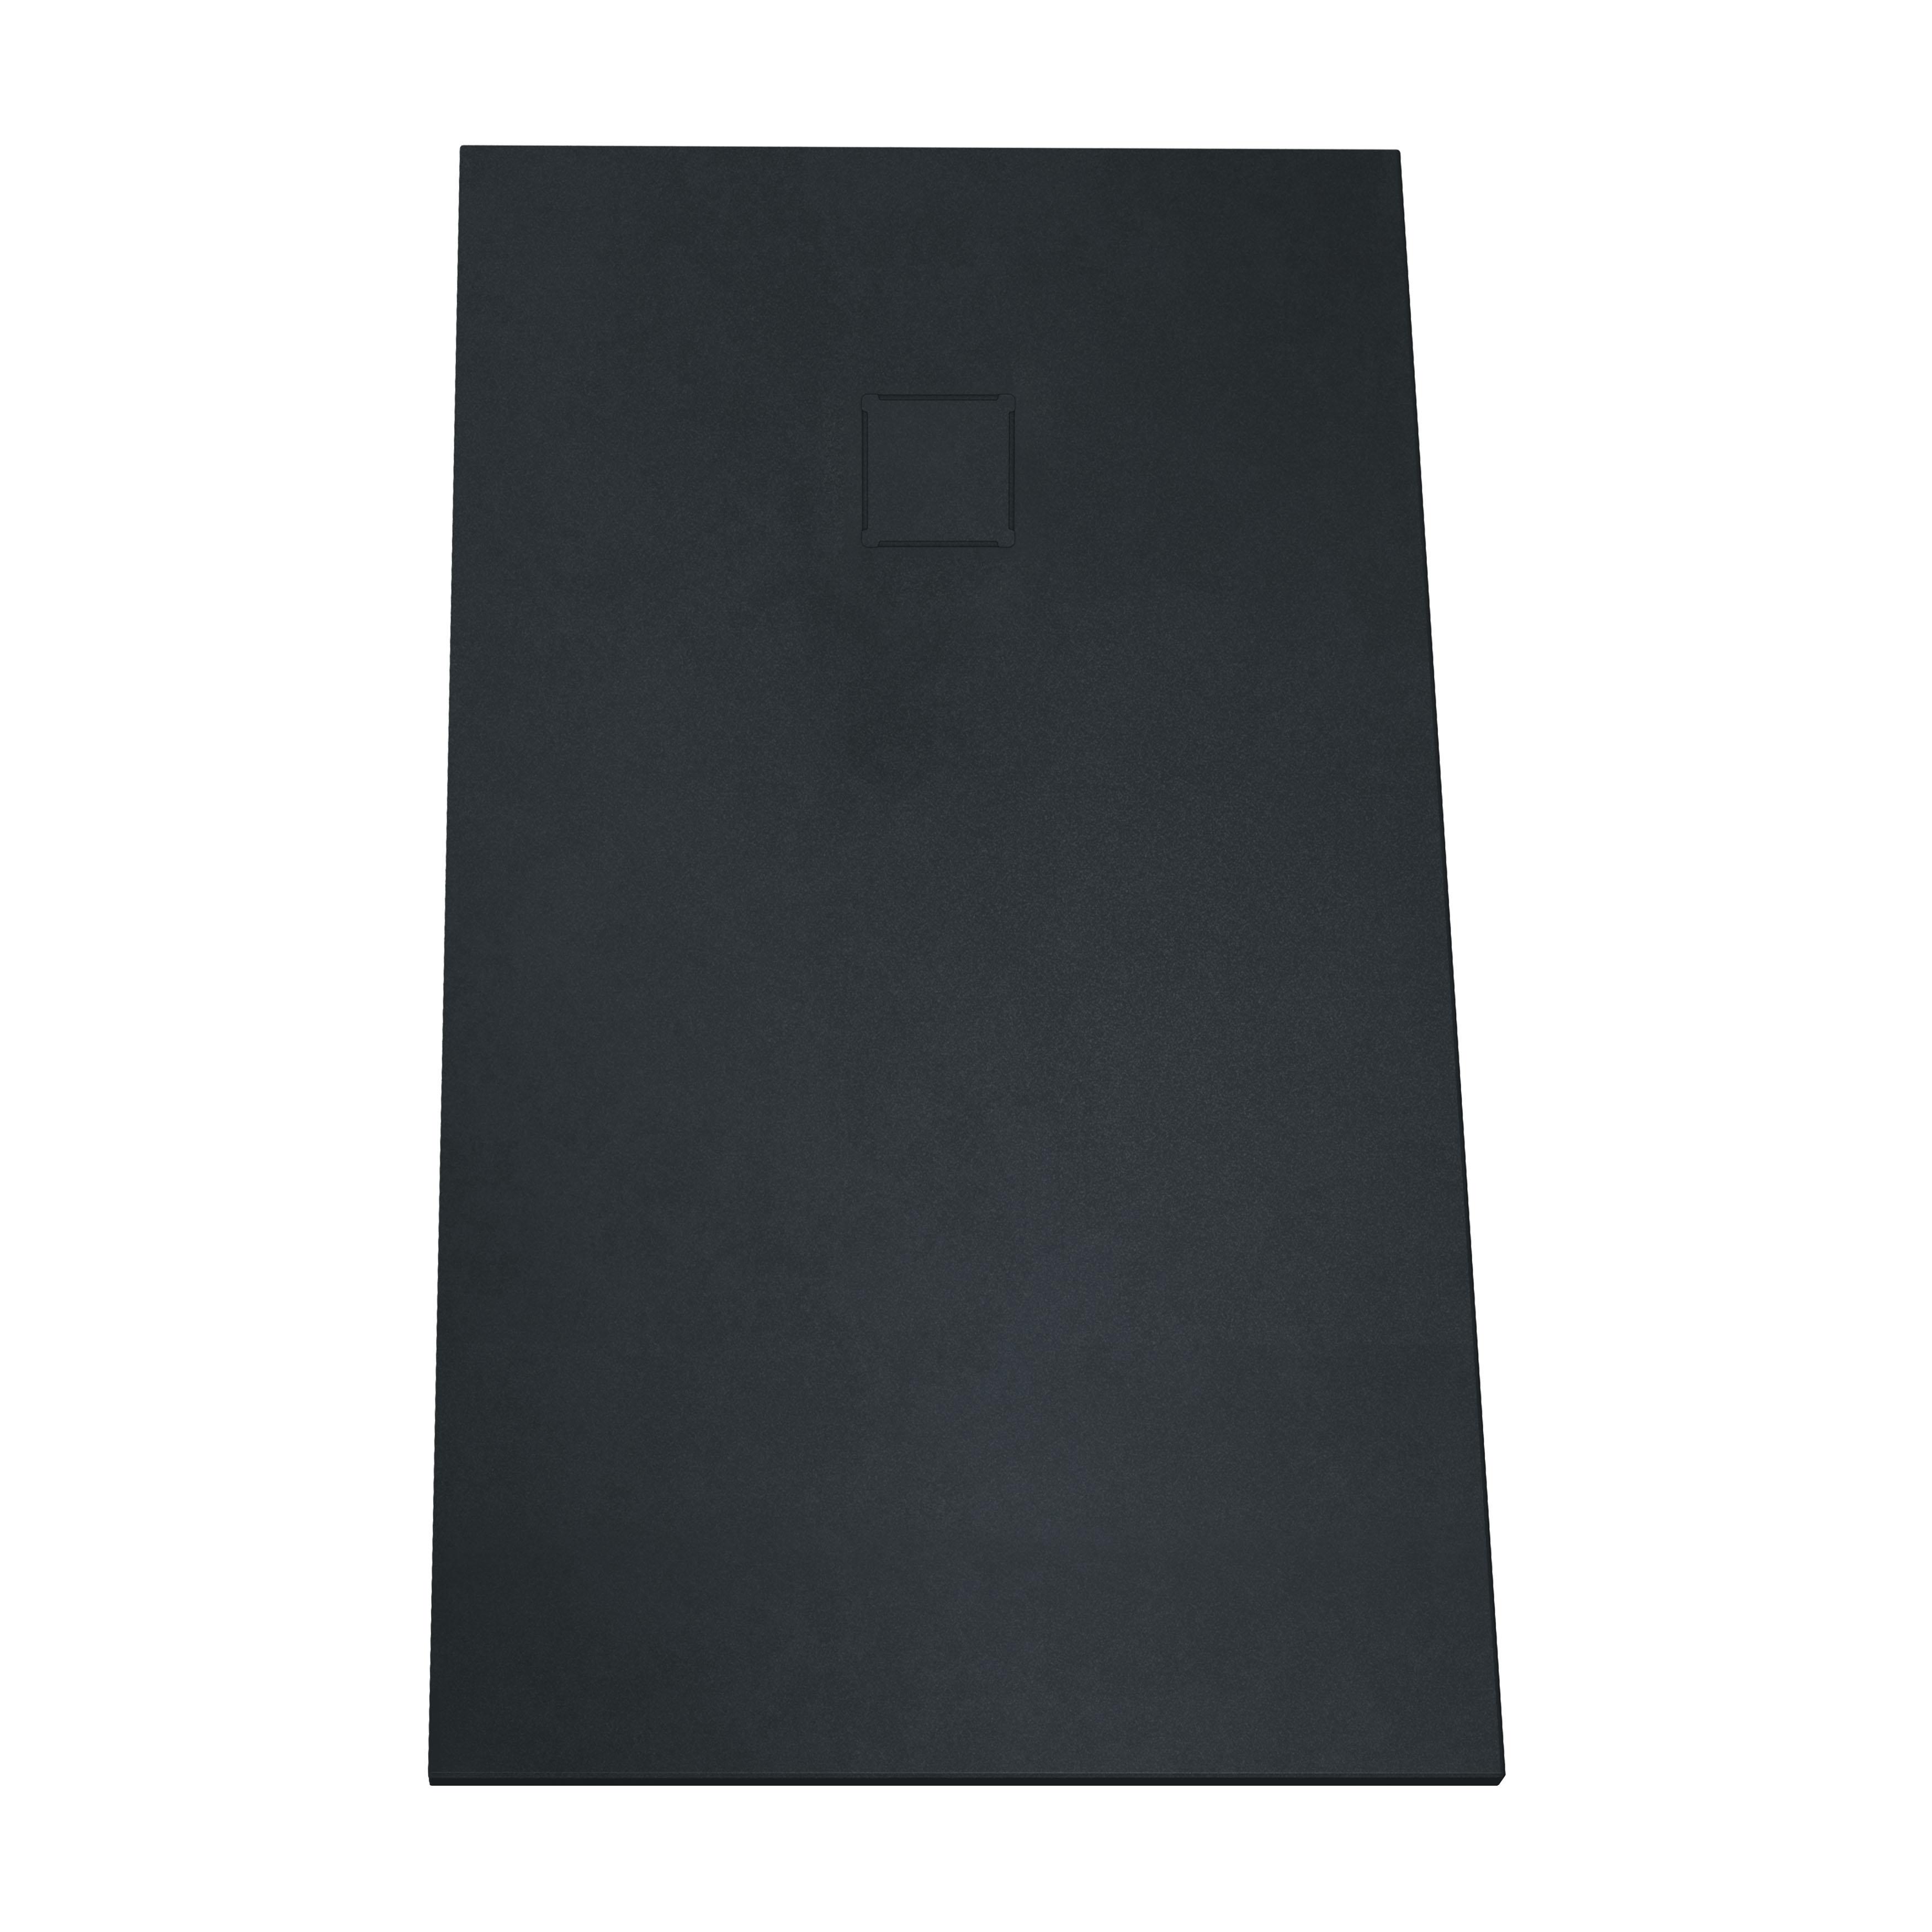 V-stone, receveur ultra plat en solid stone, 160  x  80 cm, anthraciteacite